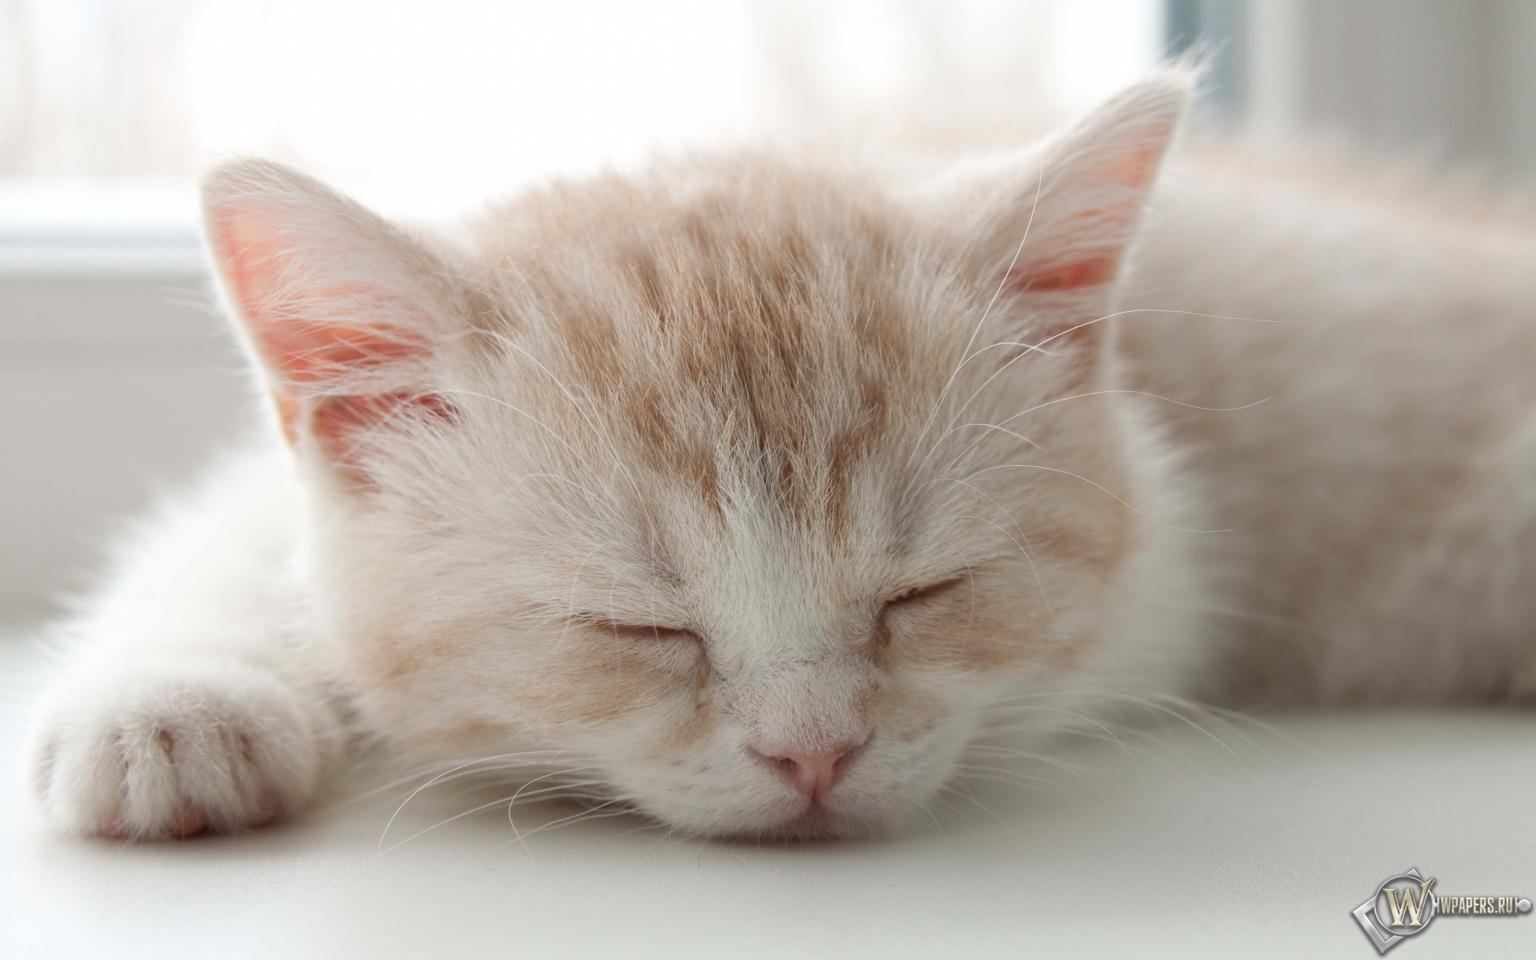 Котёнок спит 1536x960